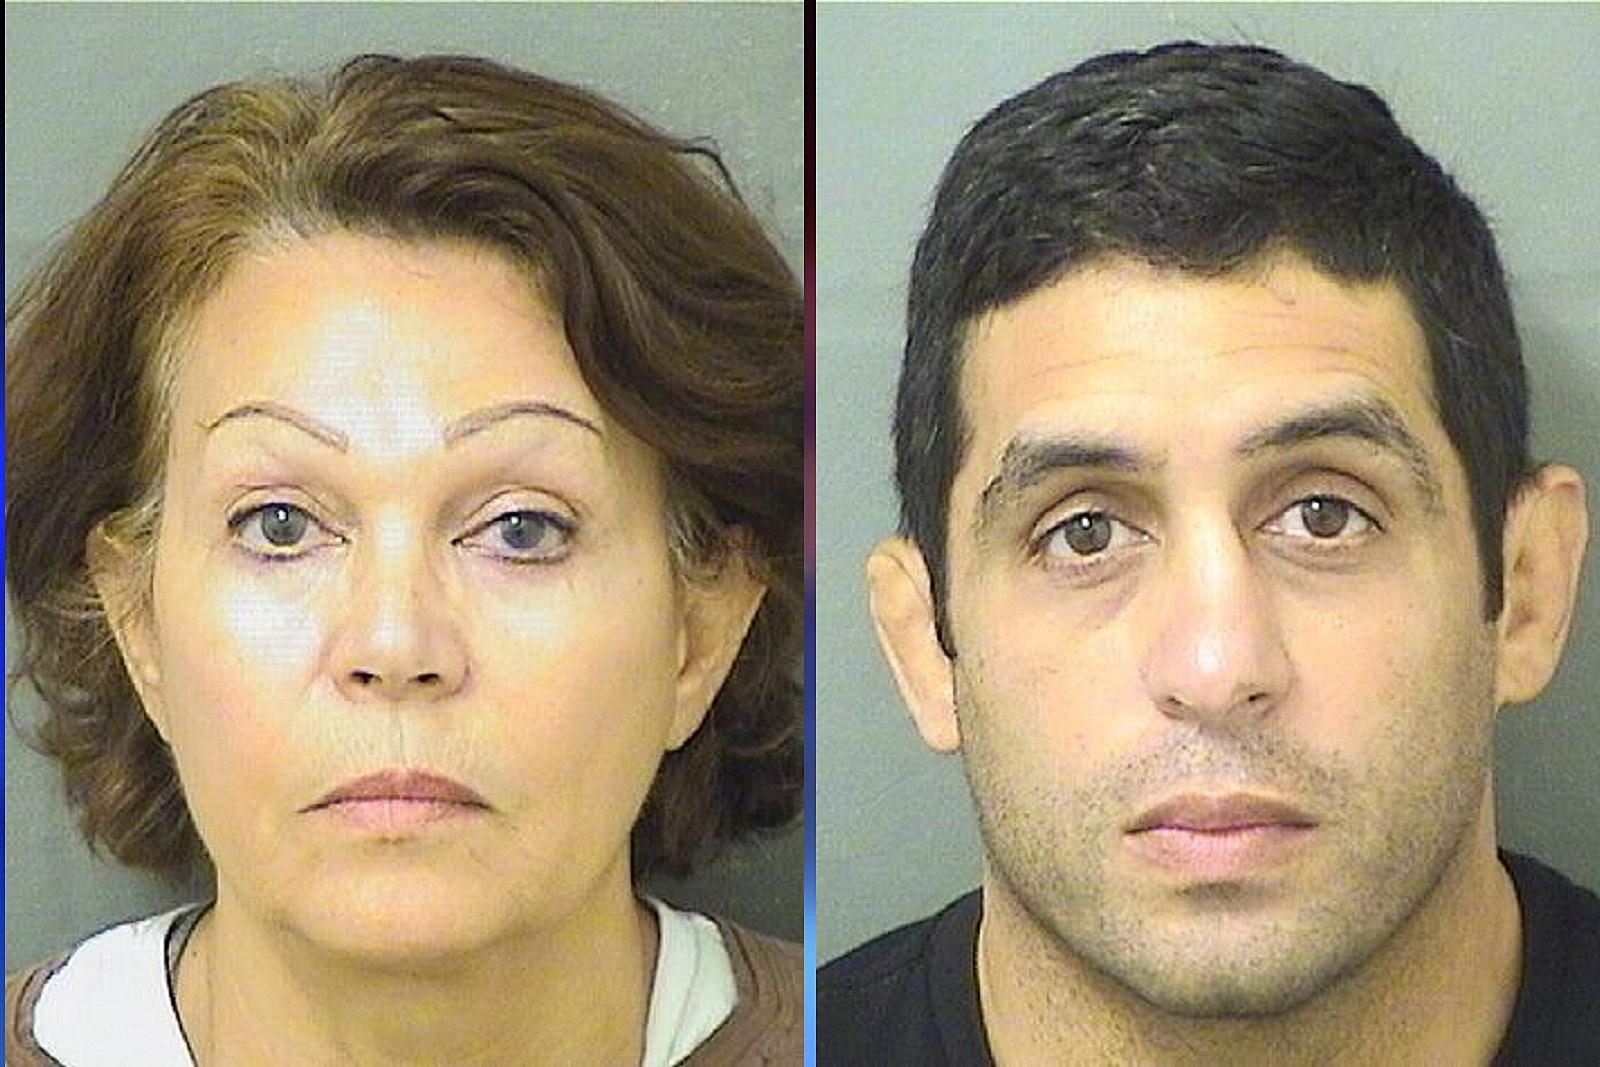 Trial in 1990s Long Branch, NJ family murders ends in hung jury